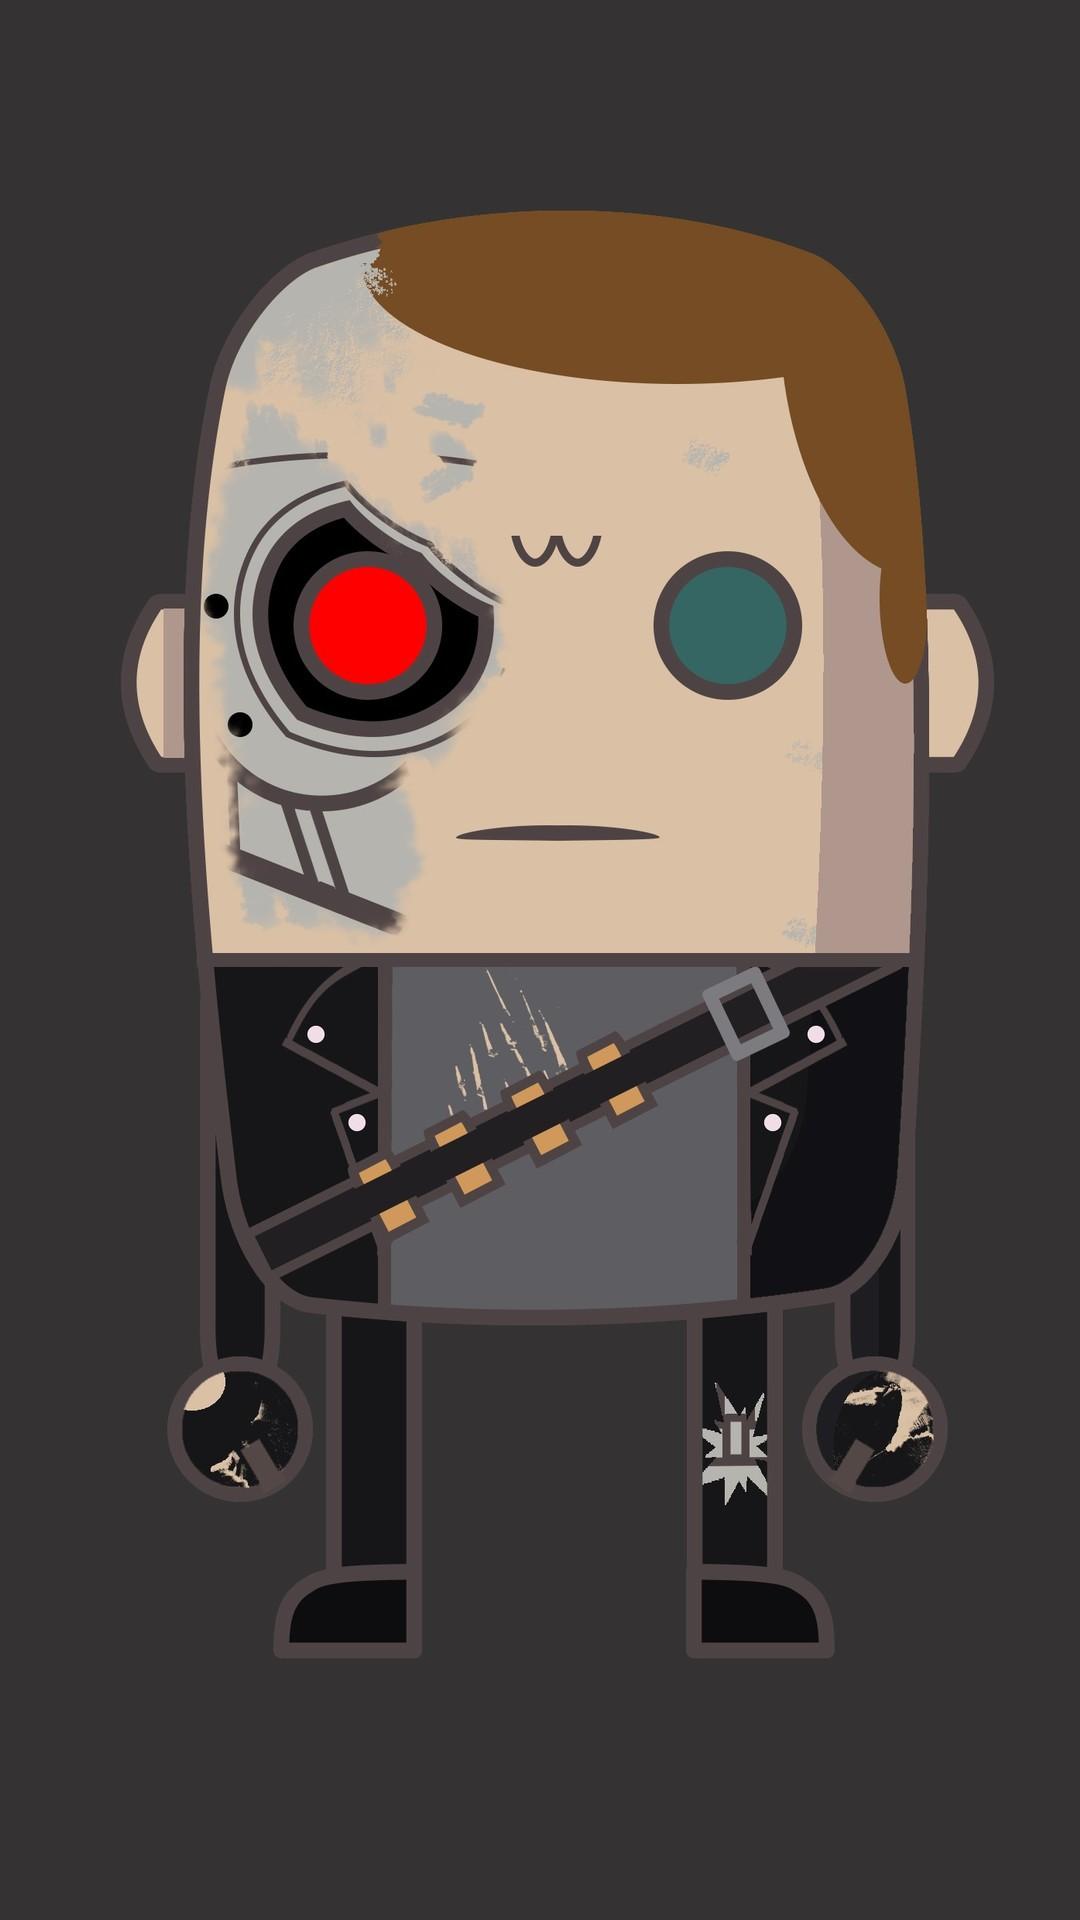 Minimal T800 Terminator iPhone Wallpaper